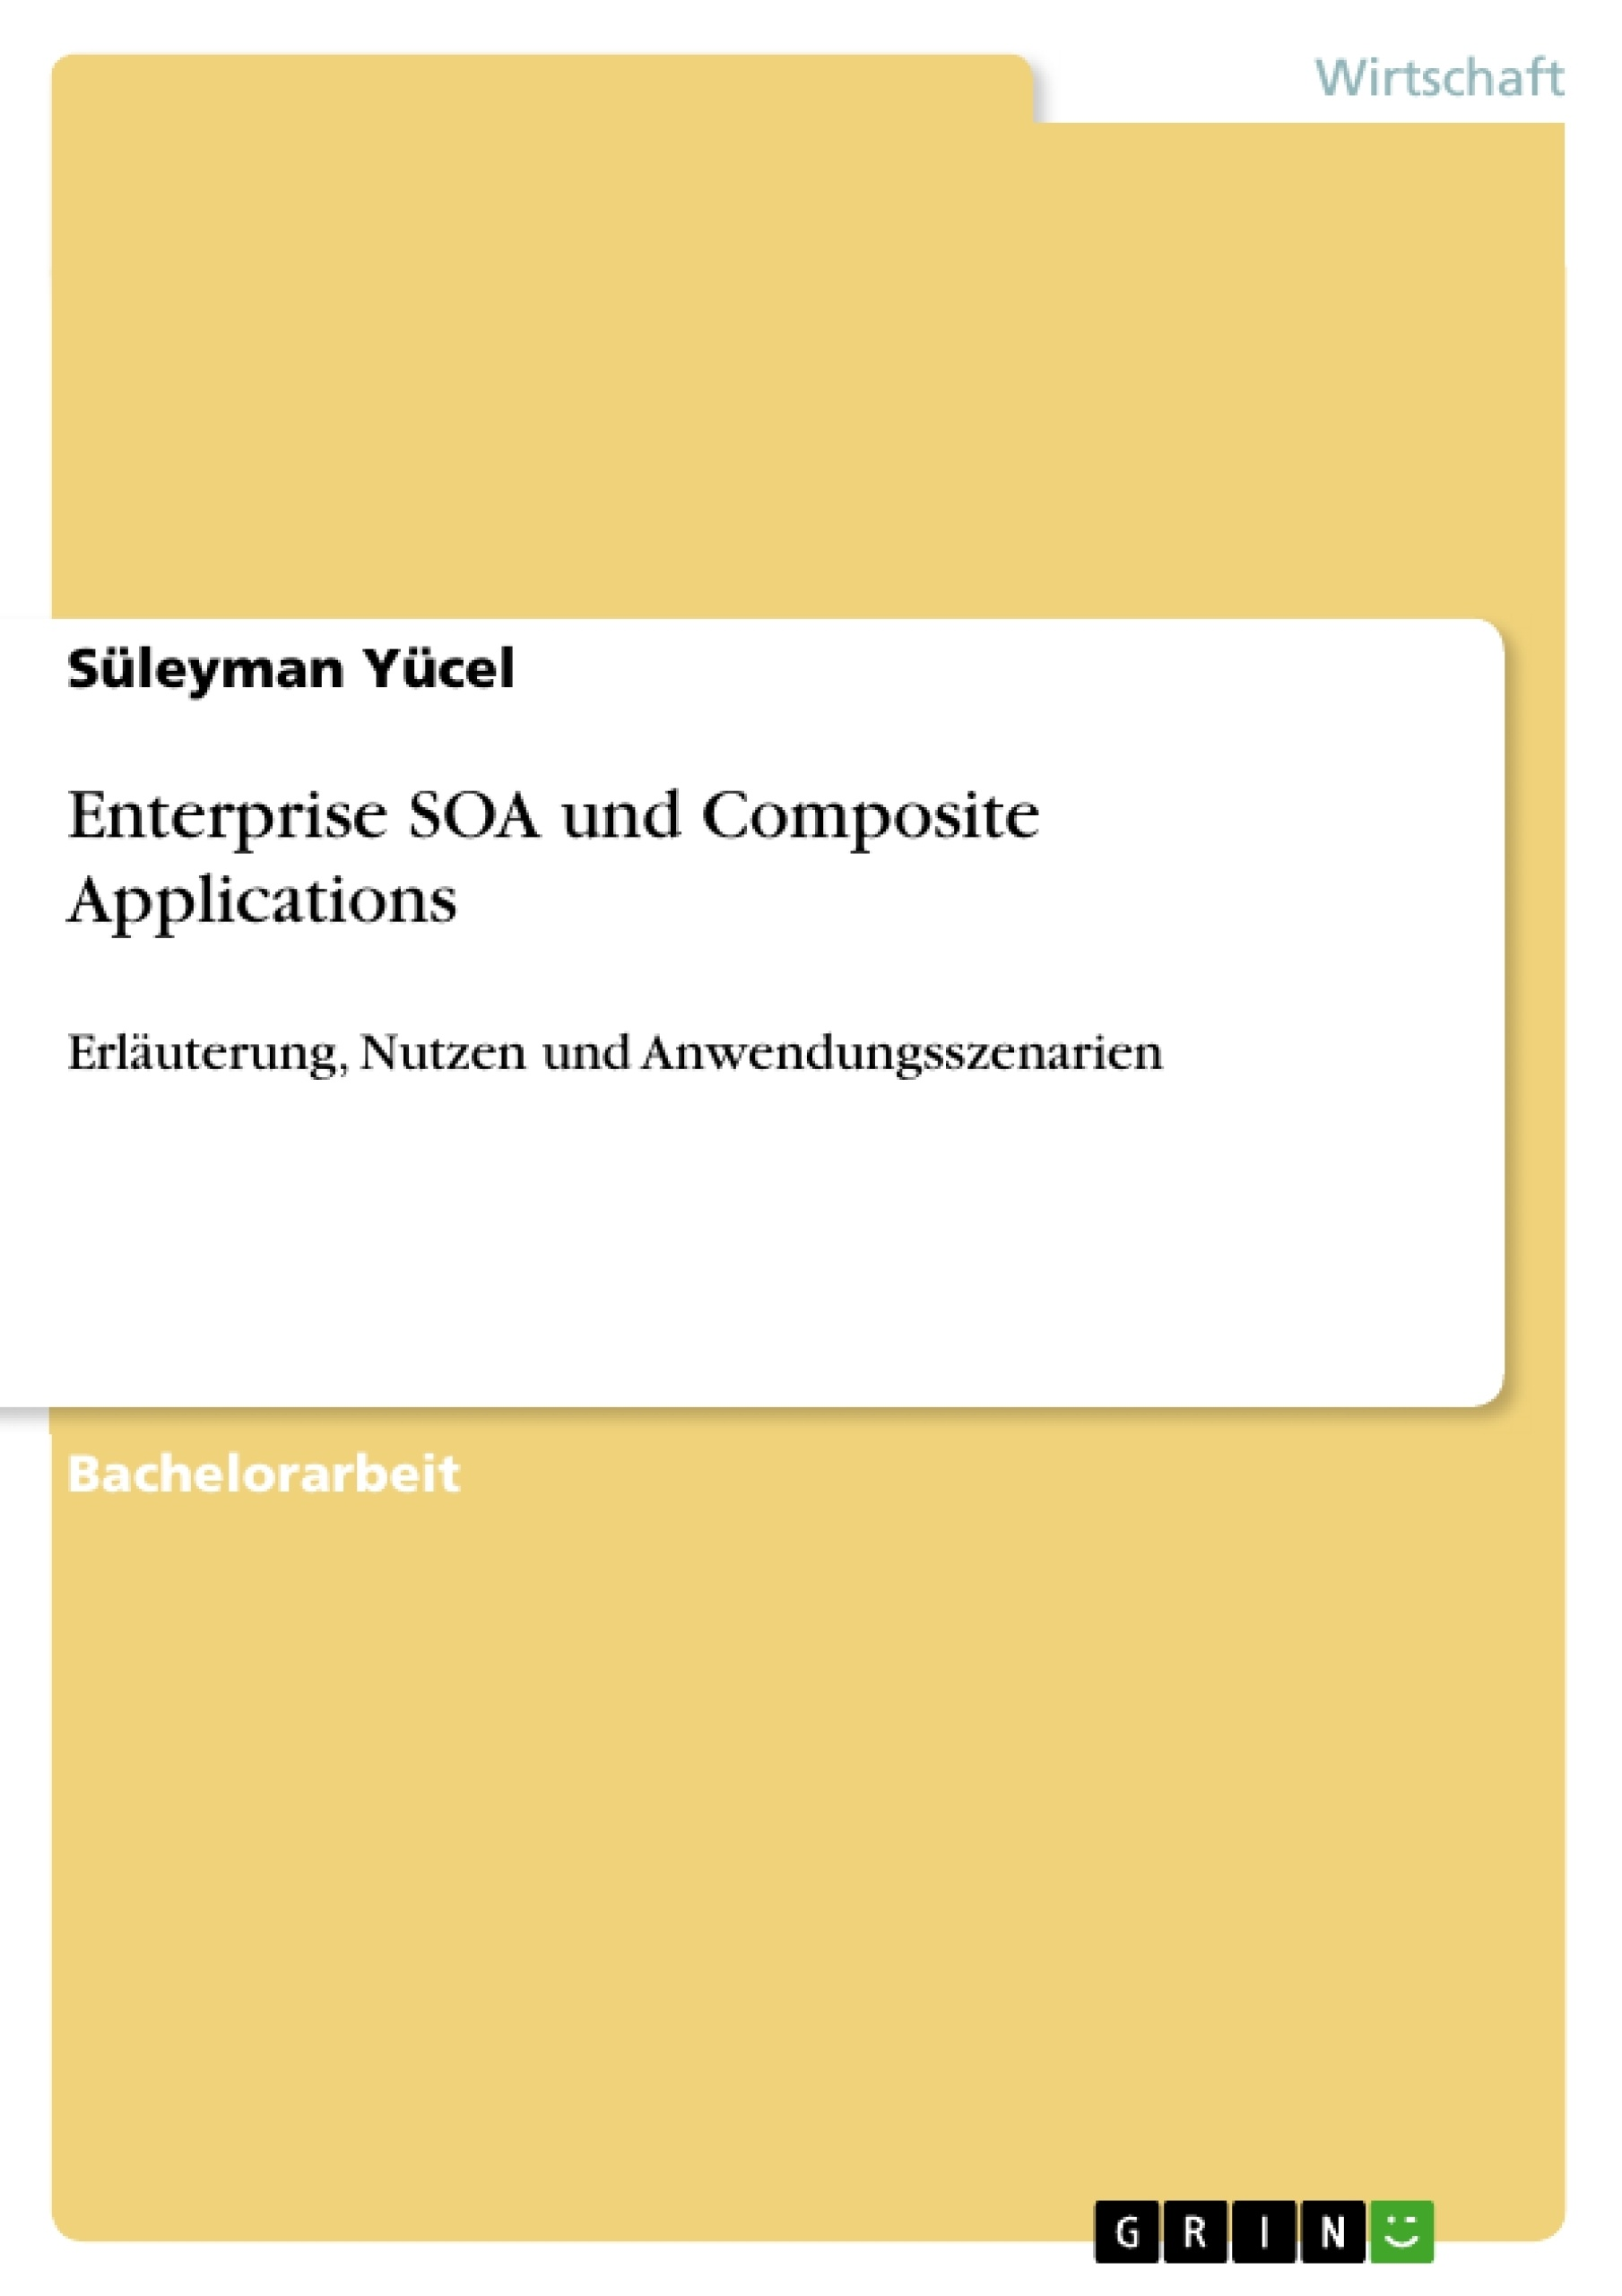 Titel: EnterpriseSOAund Composite Applications